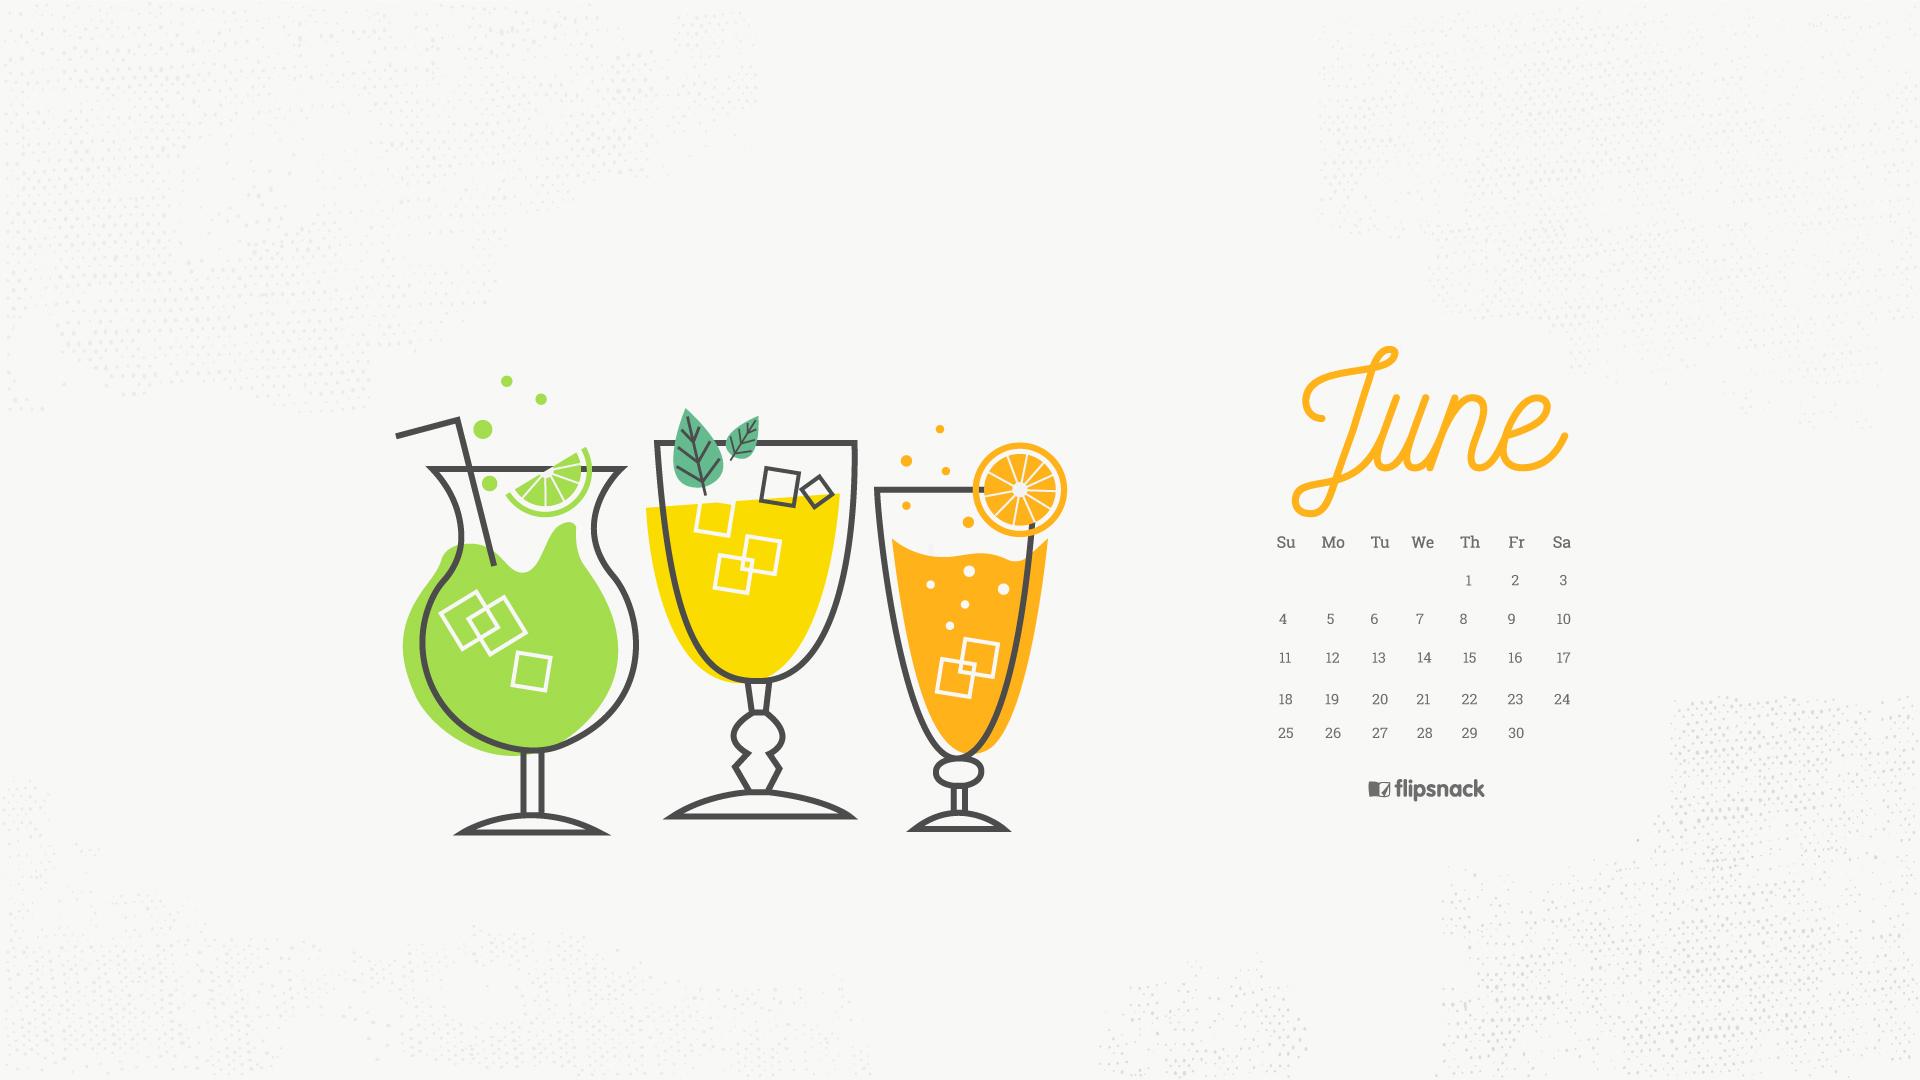 June 2017 calendar wallpaper for desktop background 1920x1080